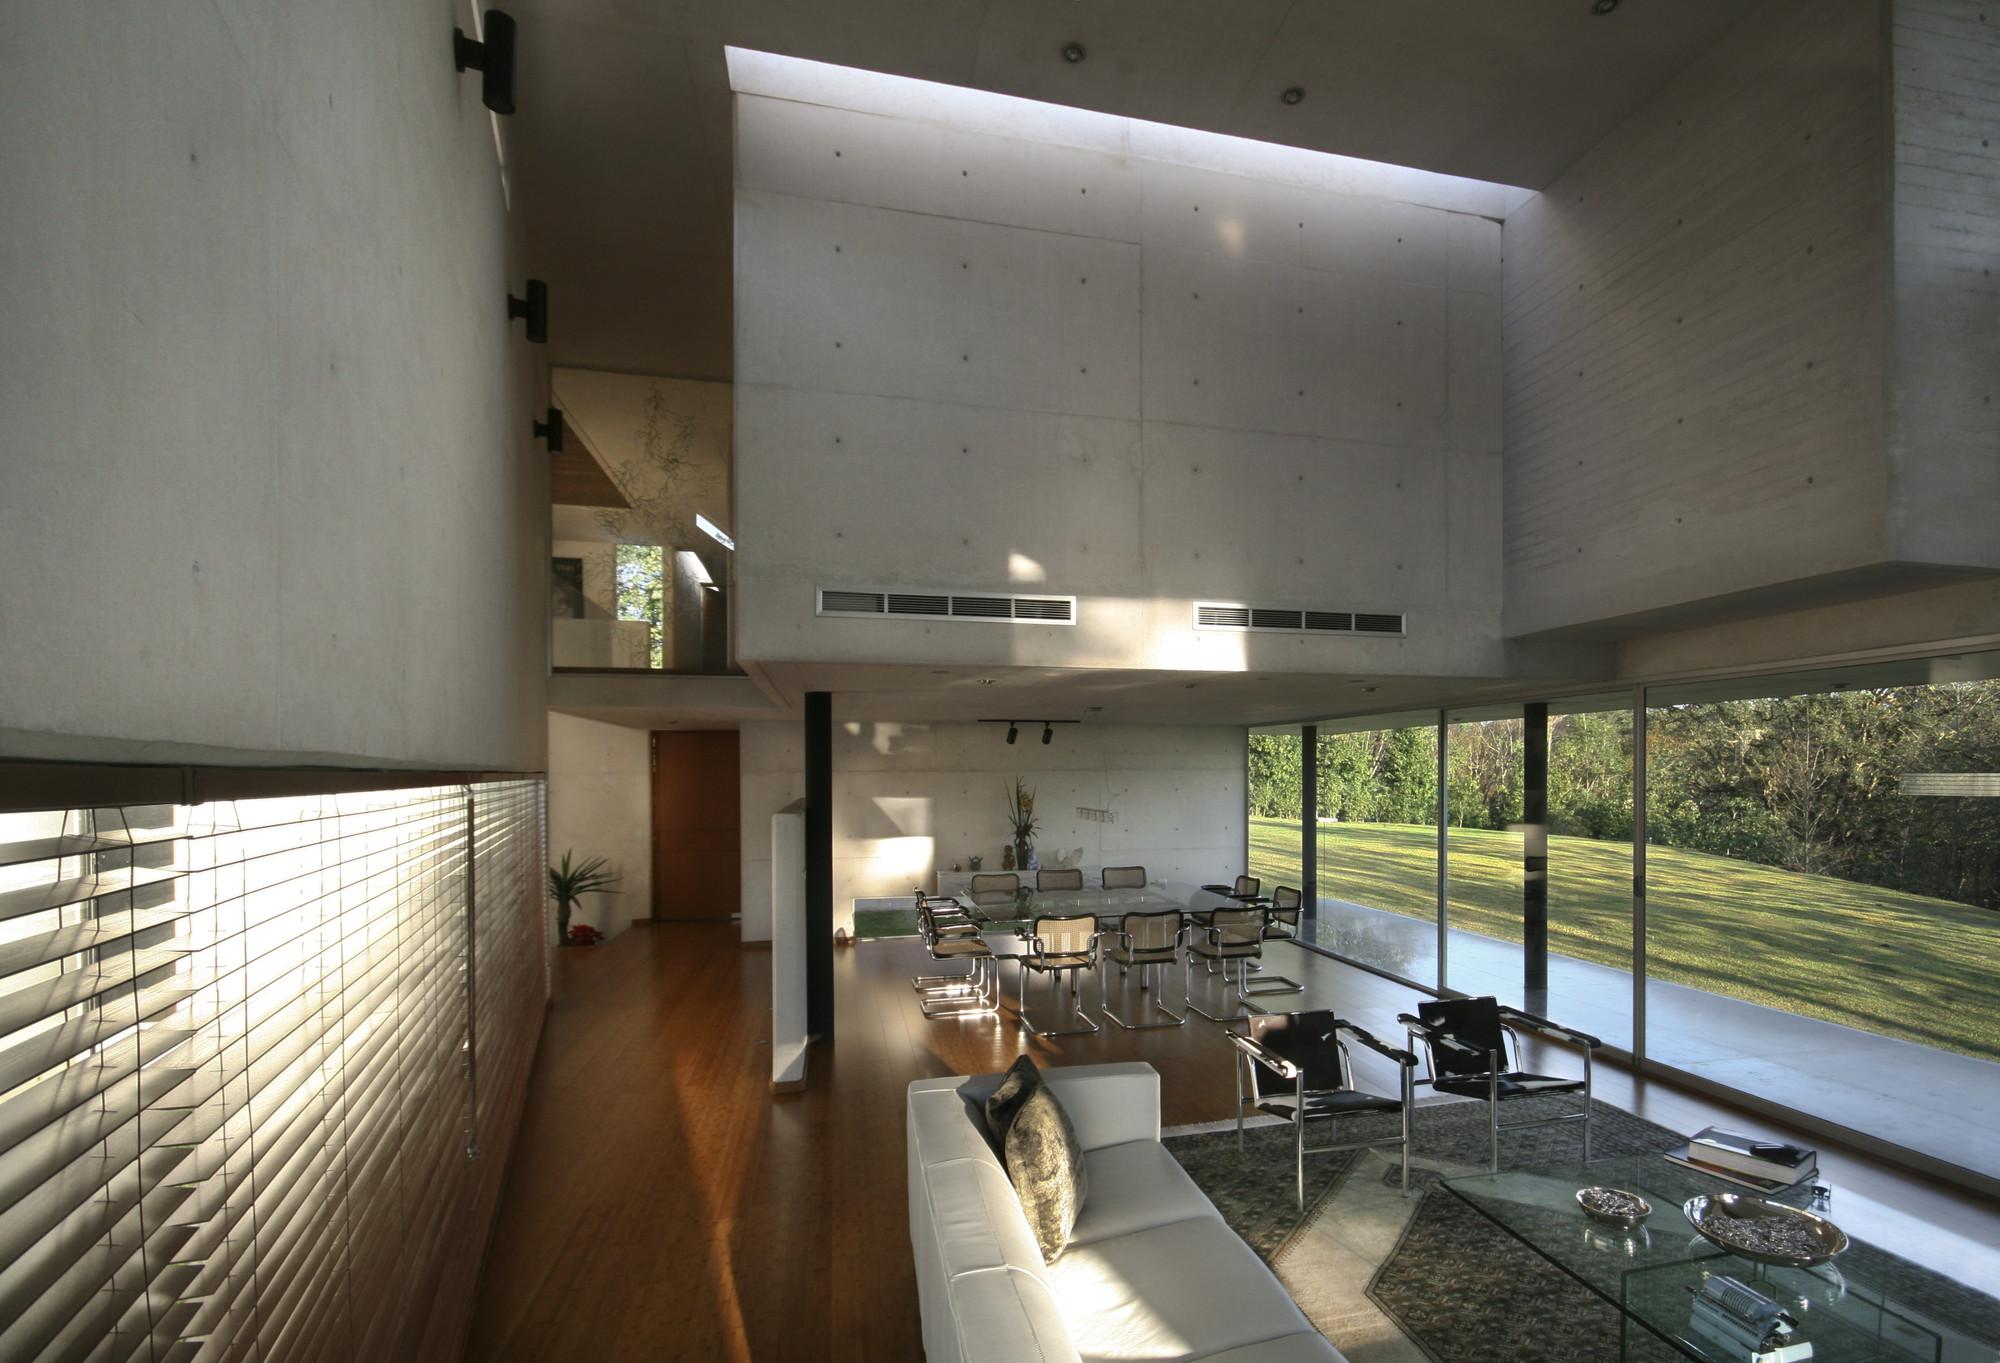 Galeria de casa briones rp arquitectos 8